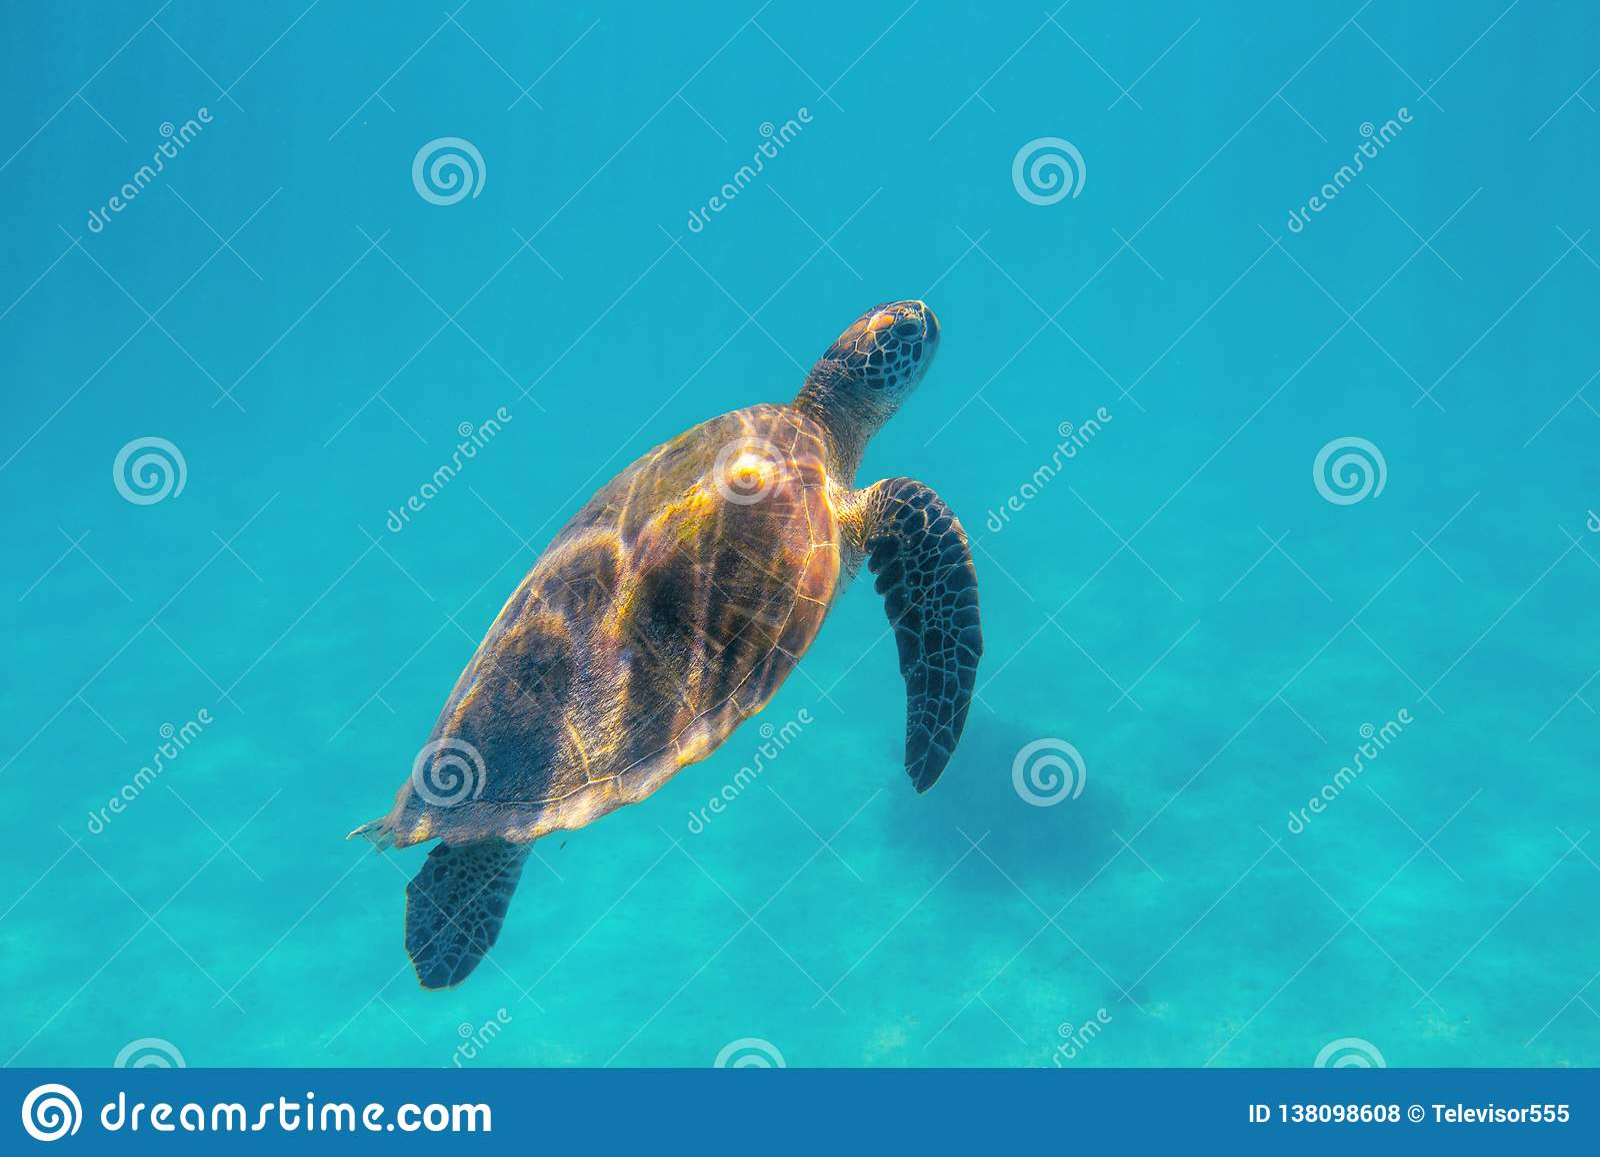 Marine turtle in aqua blue sea. Coral reef animal underwater photo. Marine tortoise undersea